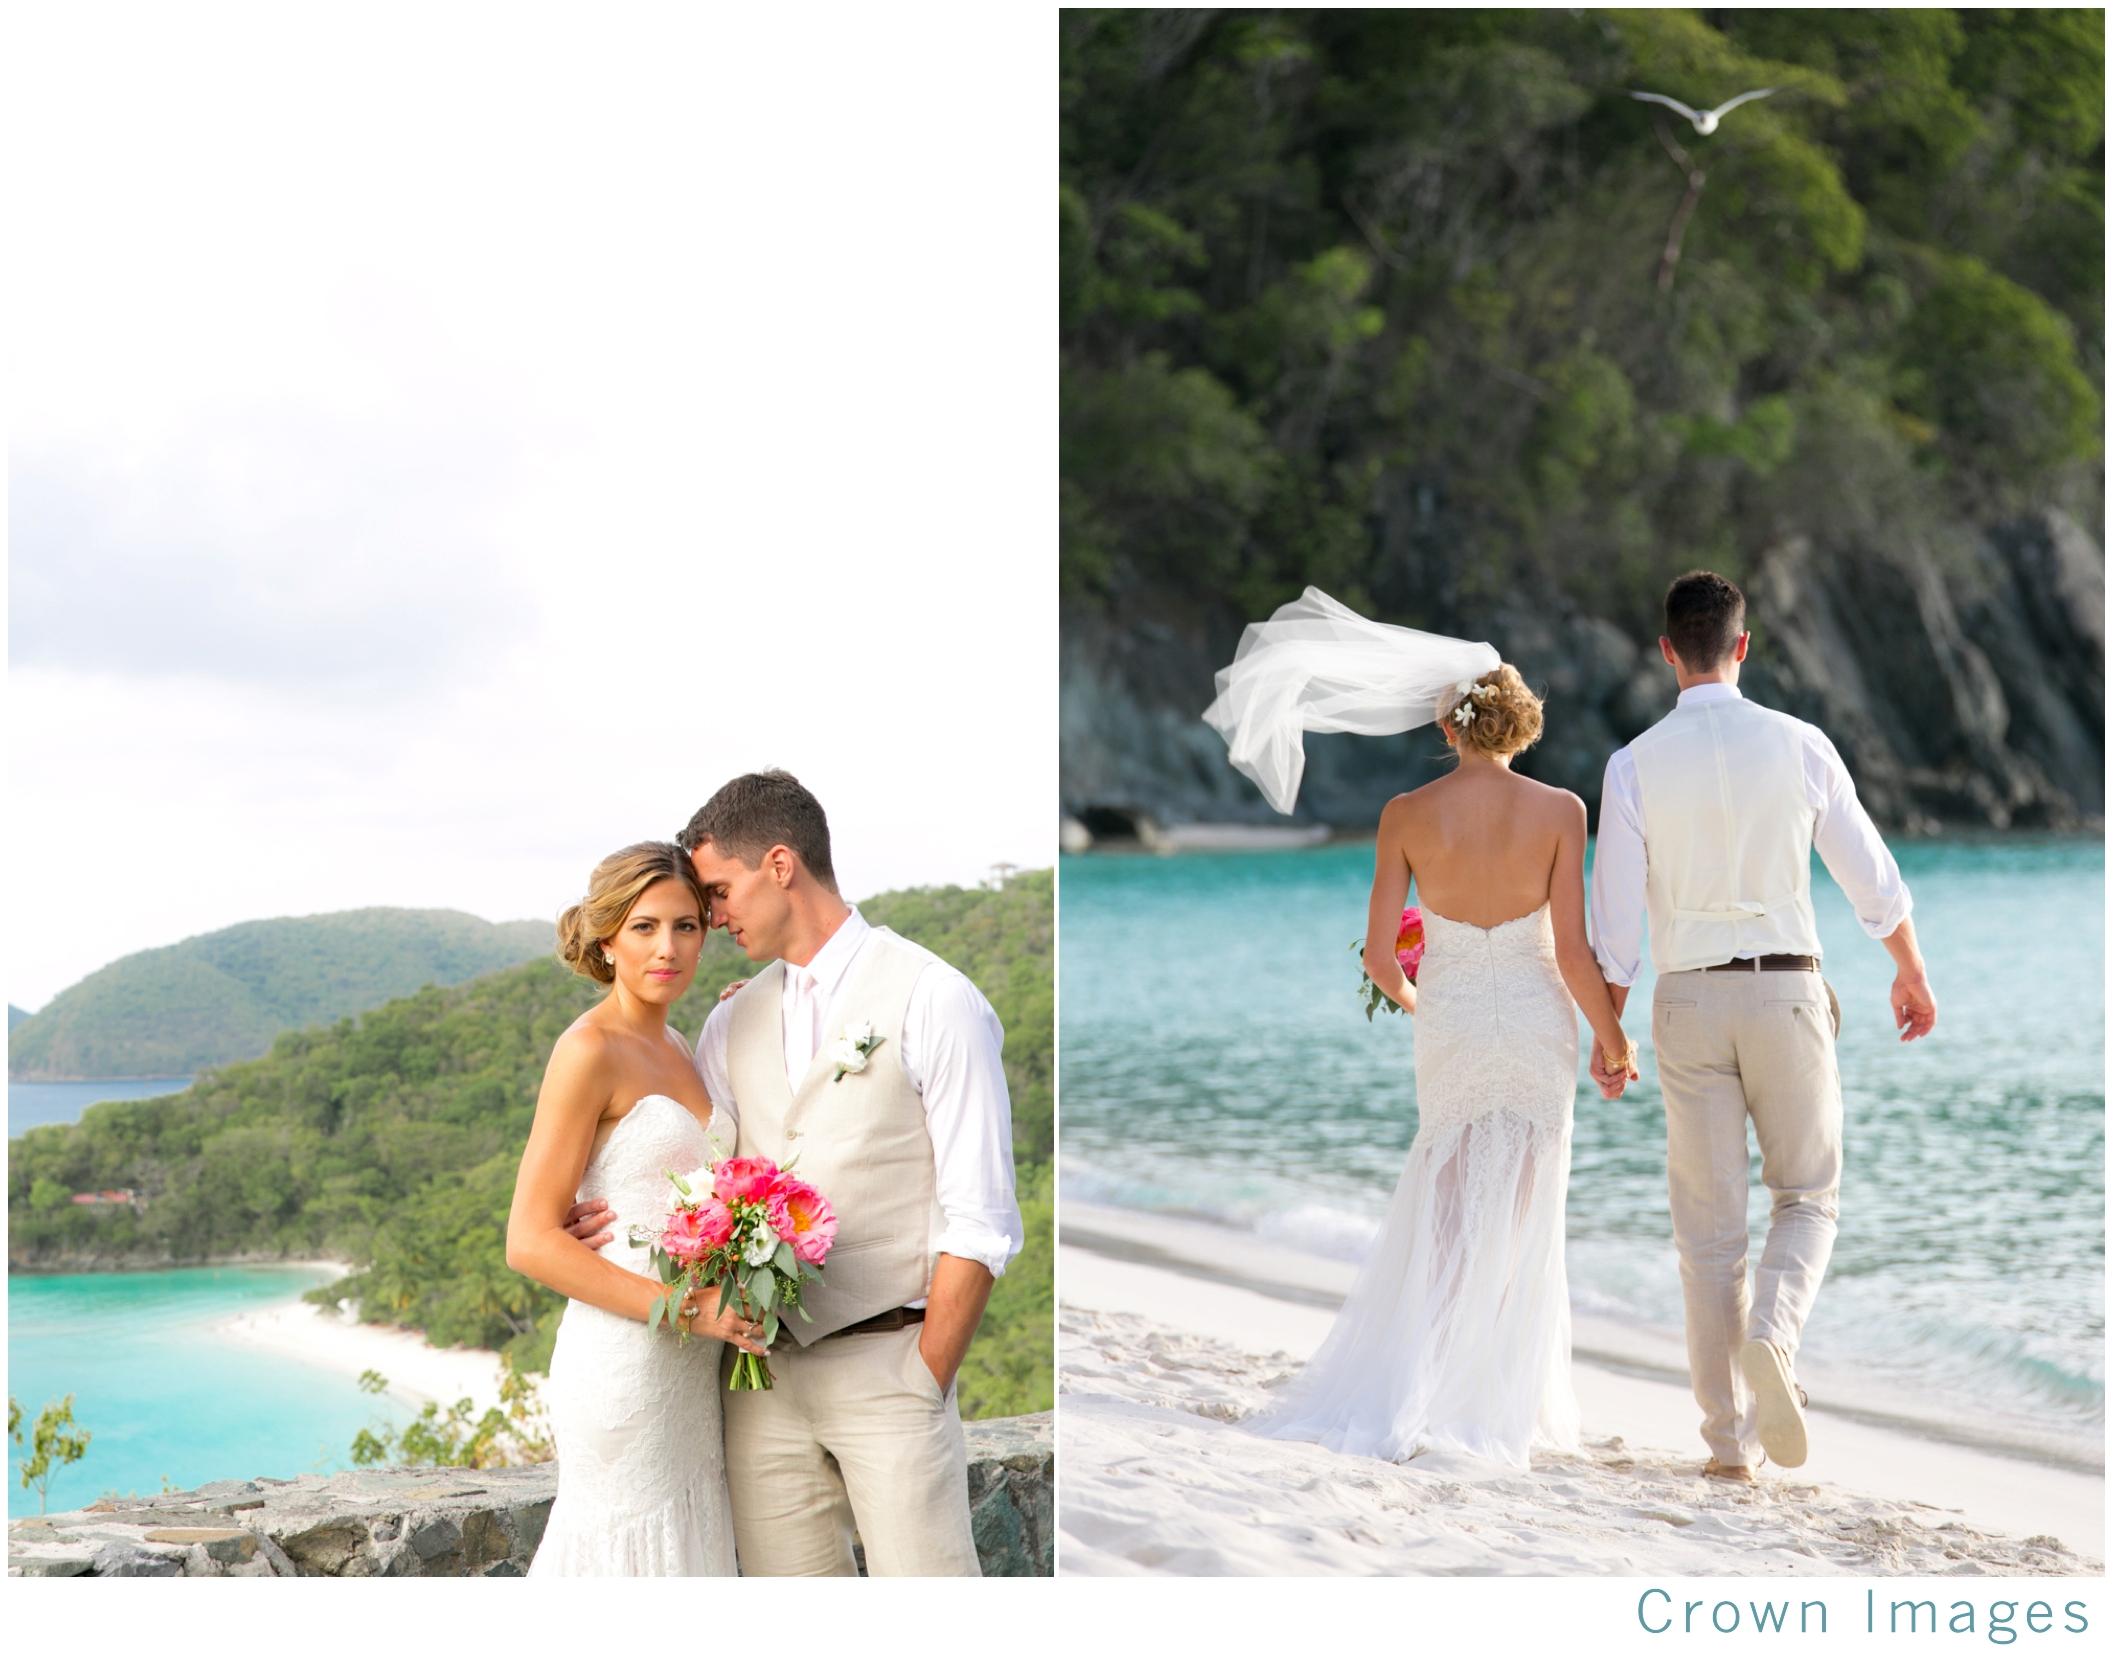 wedding photos crown images_1669.jpg